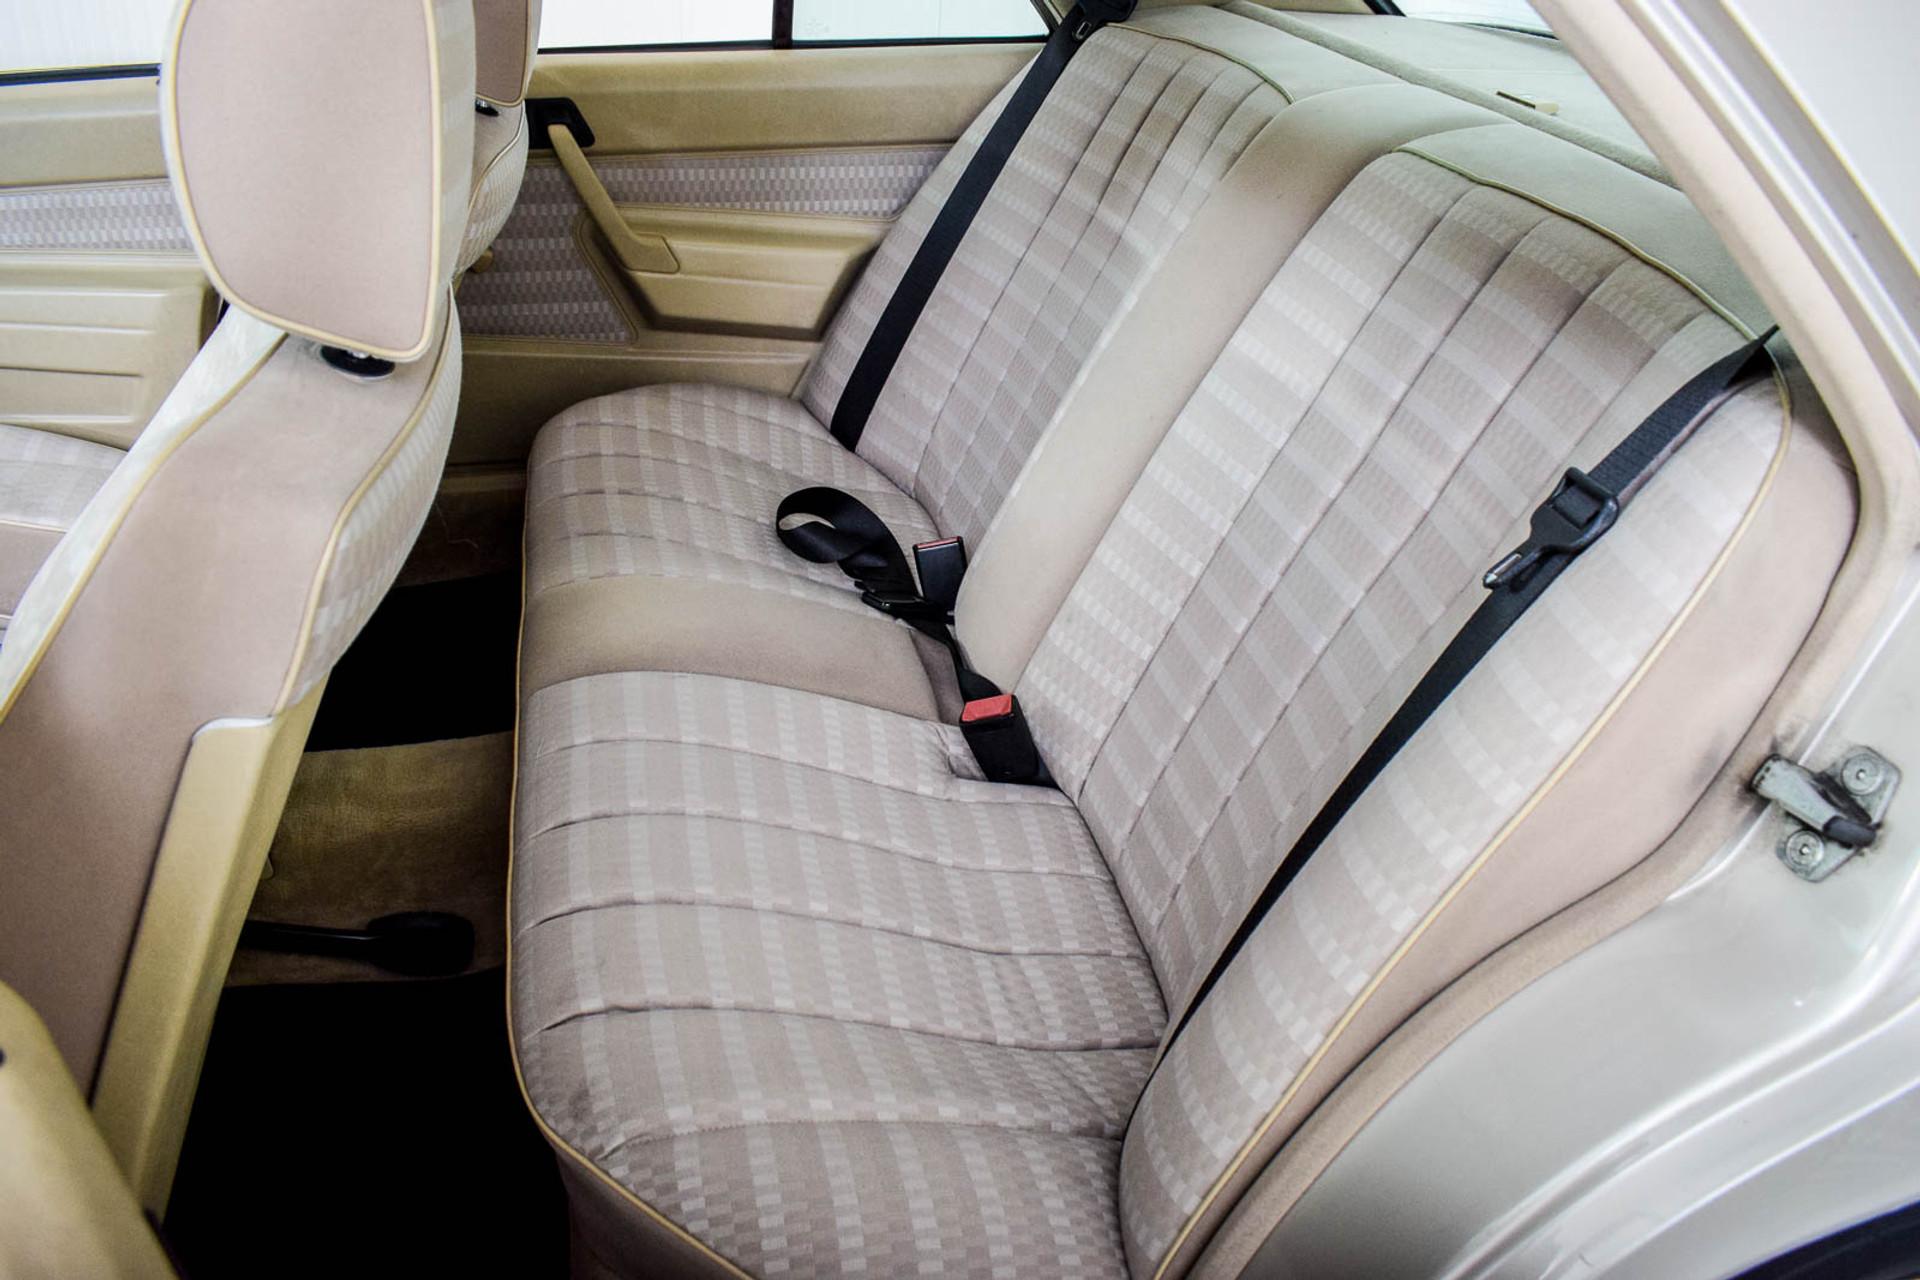 Mercedes-Benz 190 2.5 D Turbo Diesel Foto 6